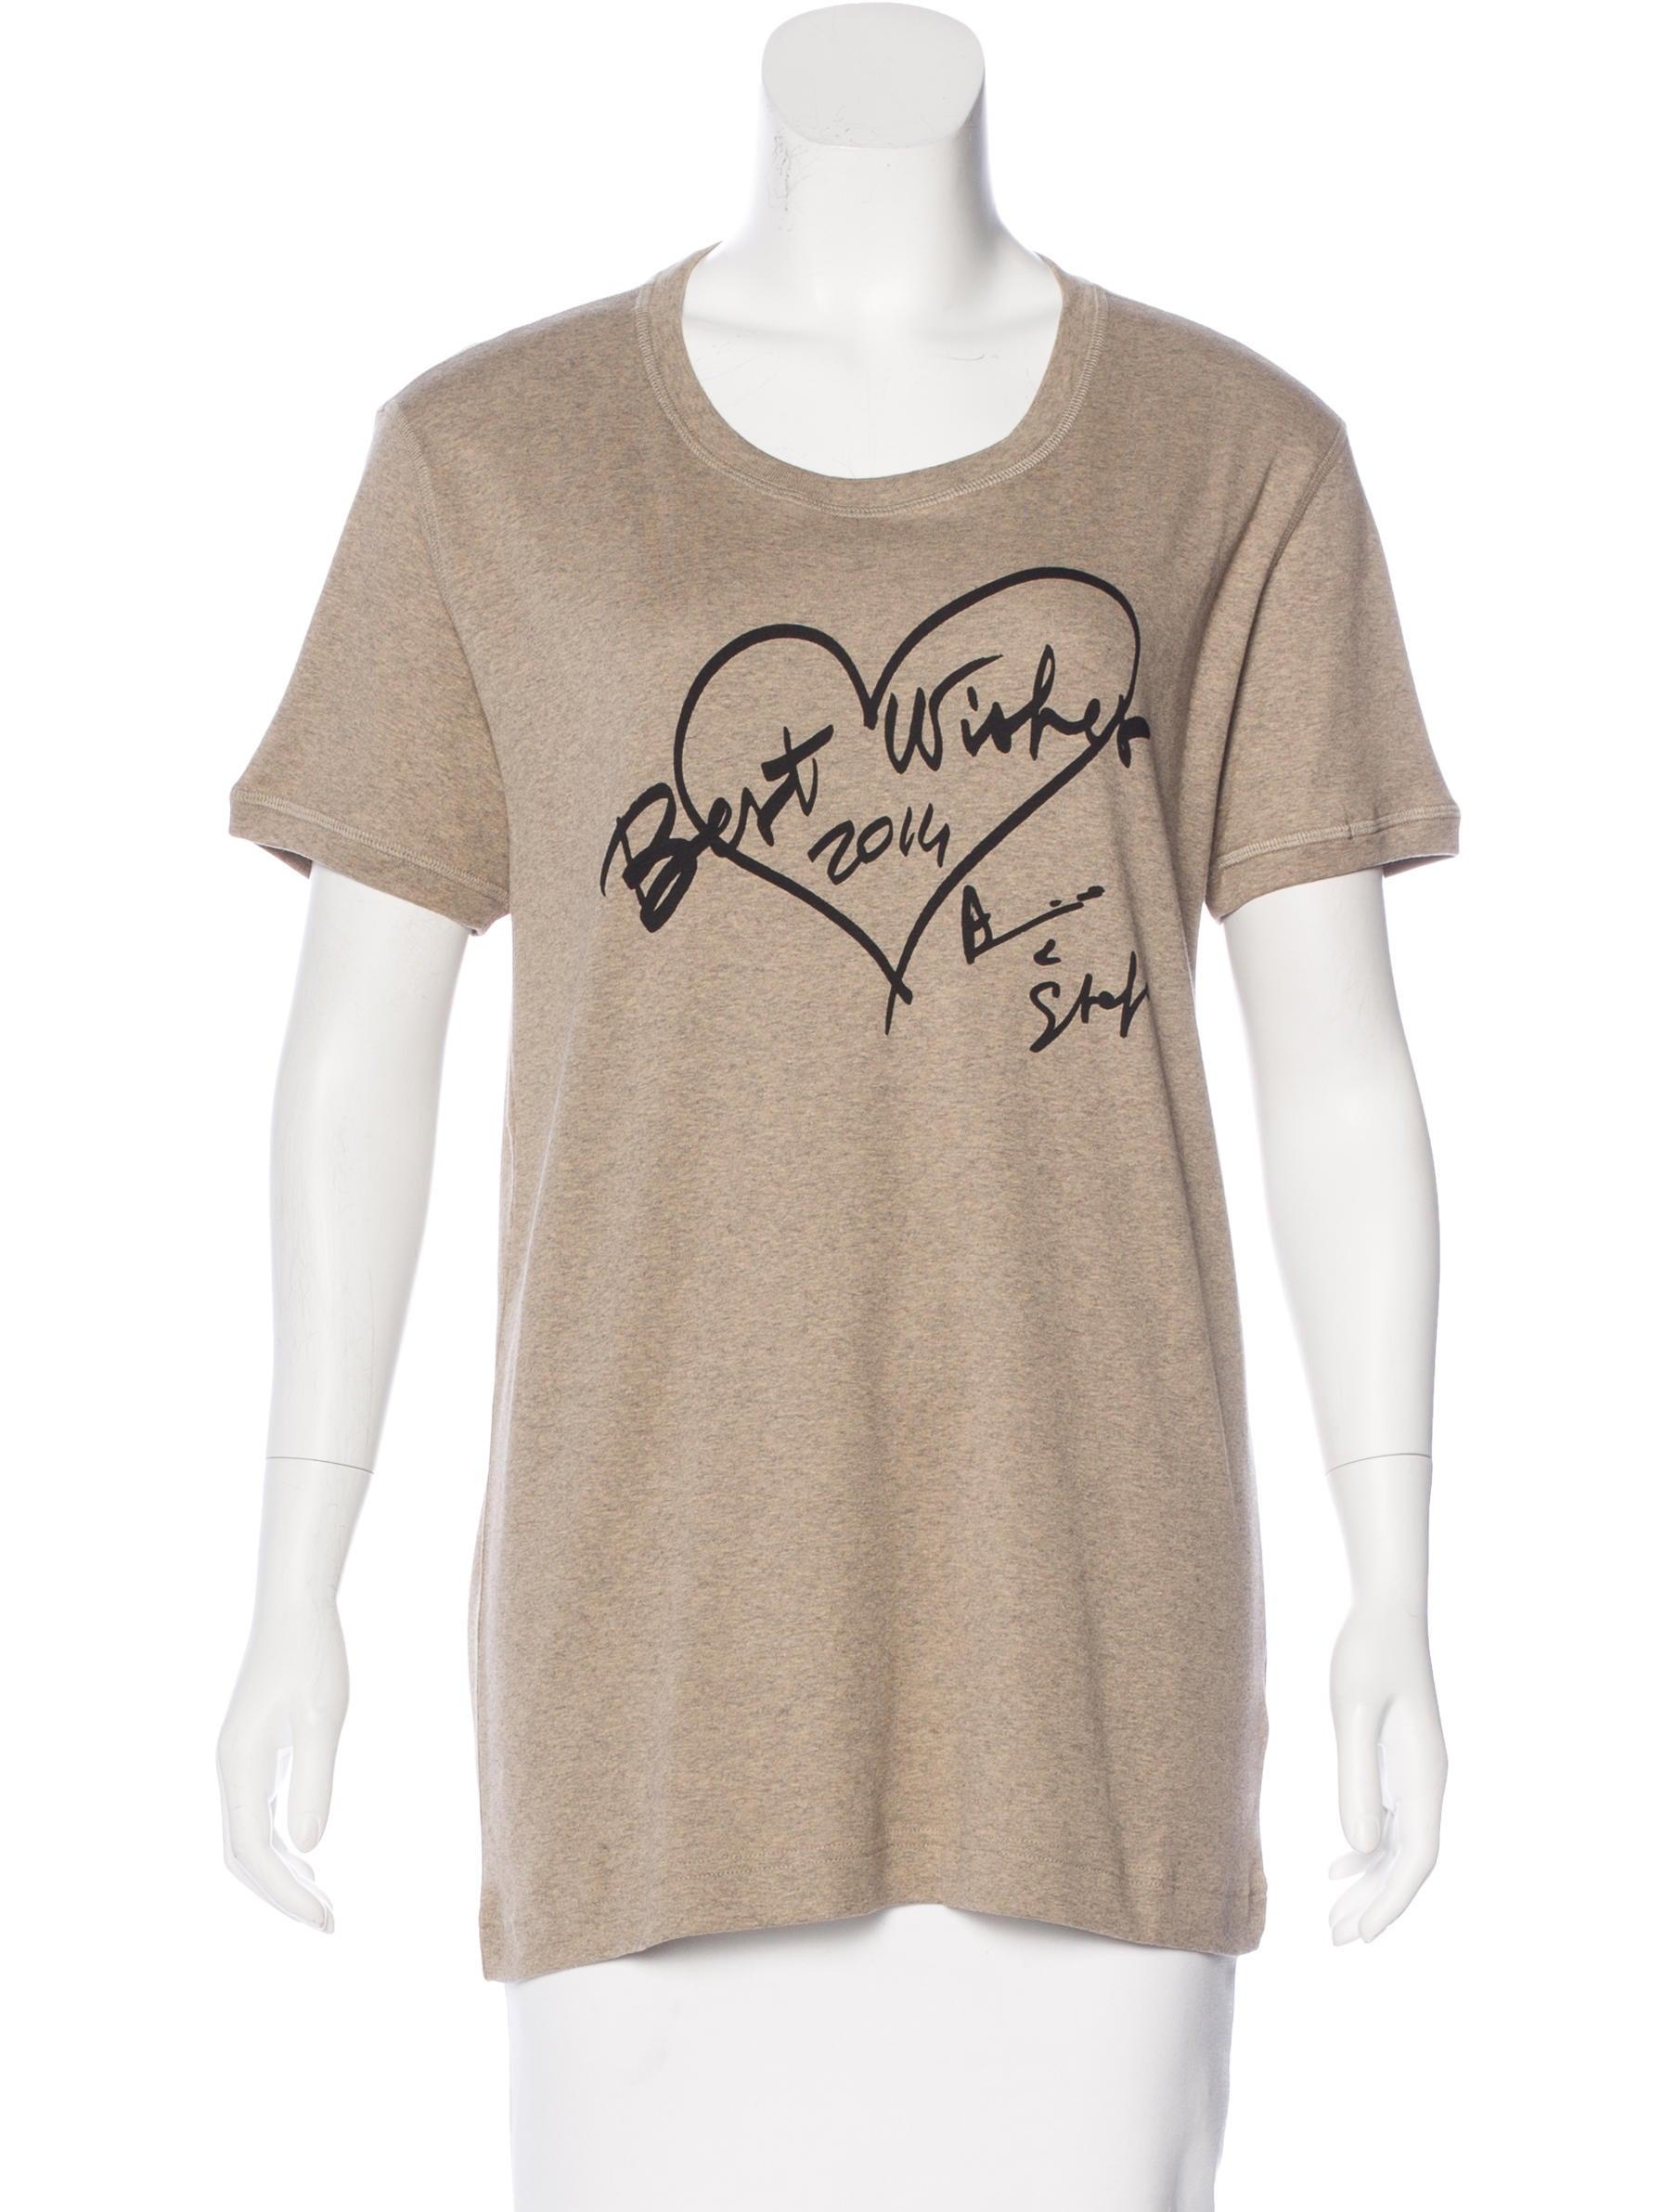 Dolce gabbana crew neck printed t shirt clothing for Dolce and gabbana printed t shirts